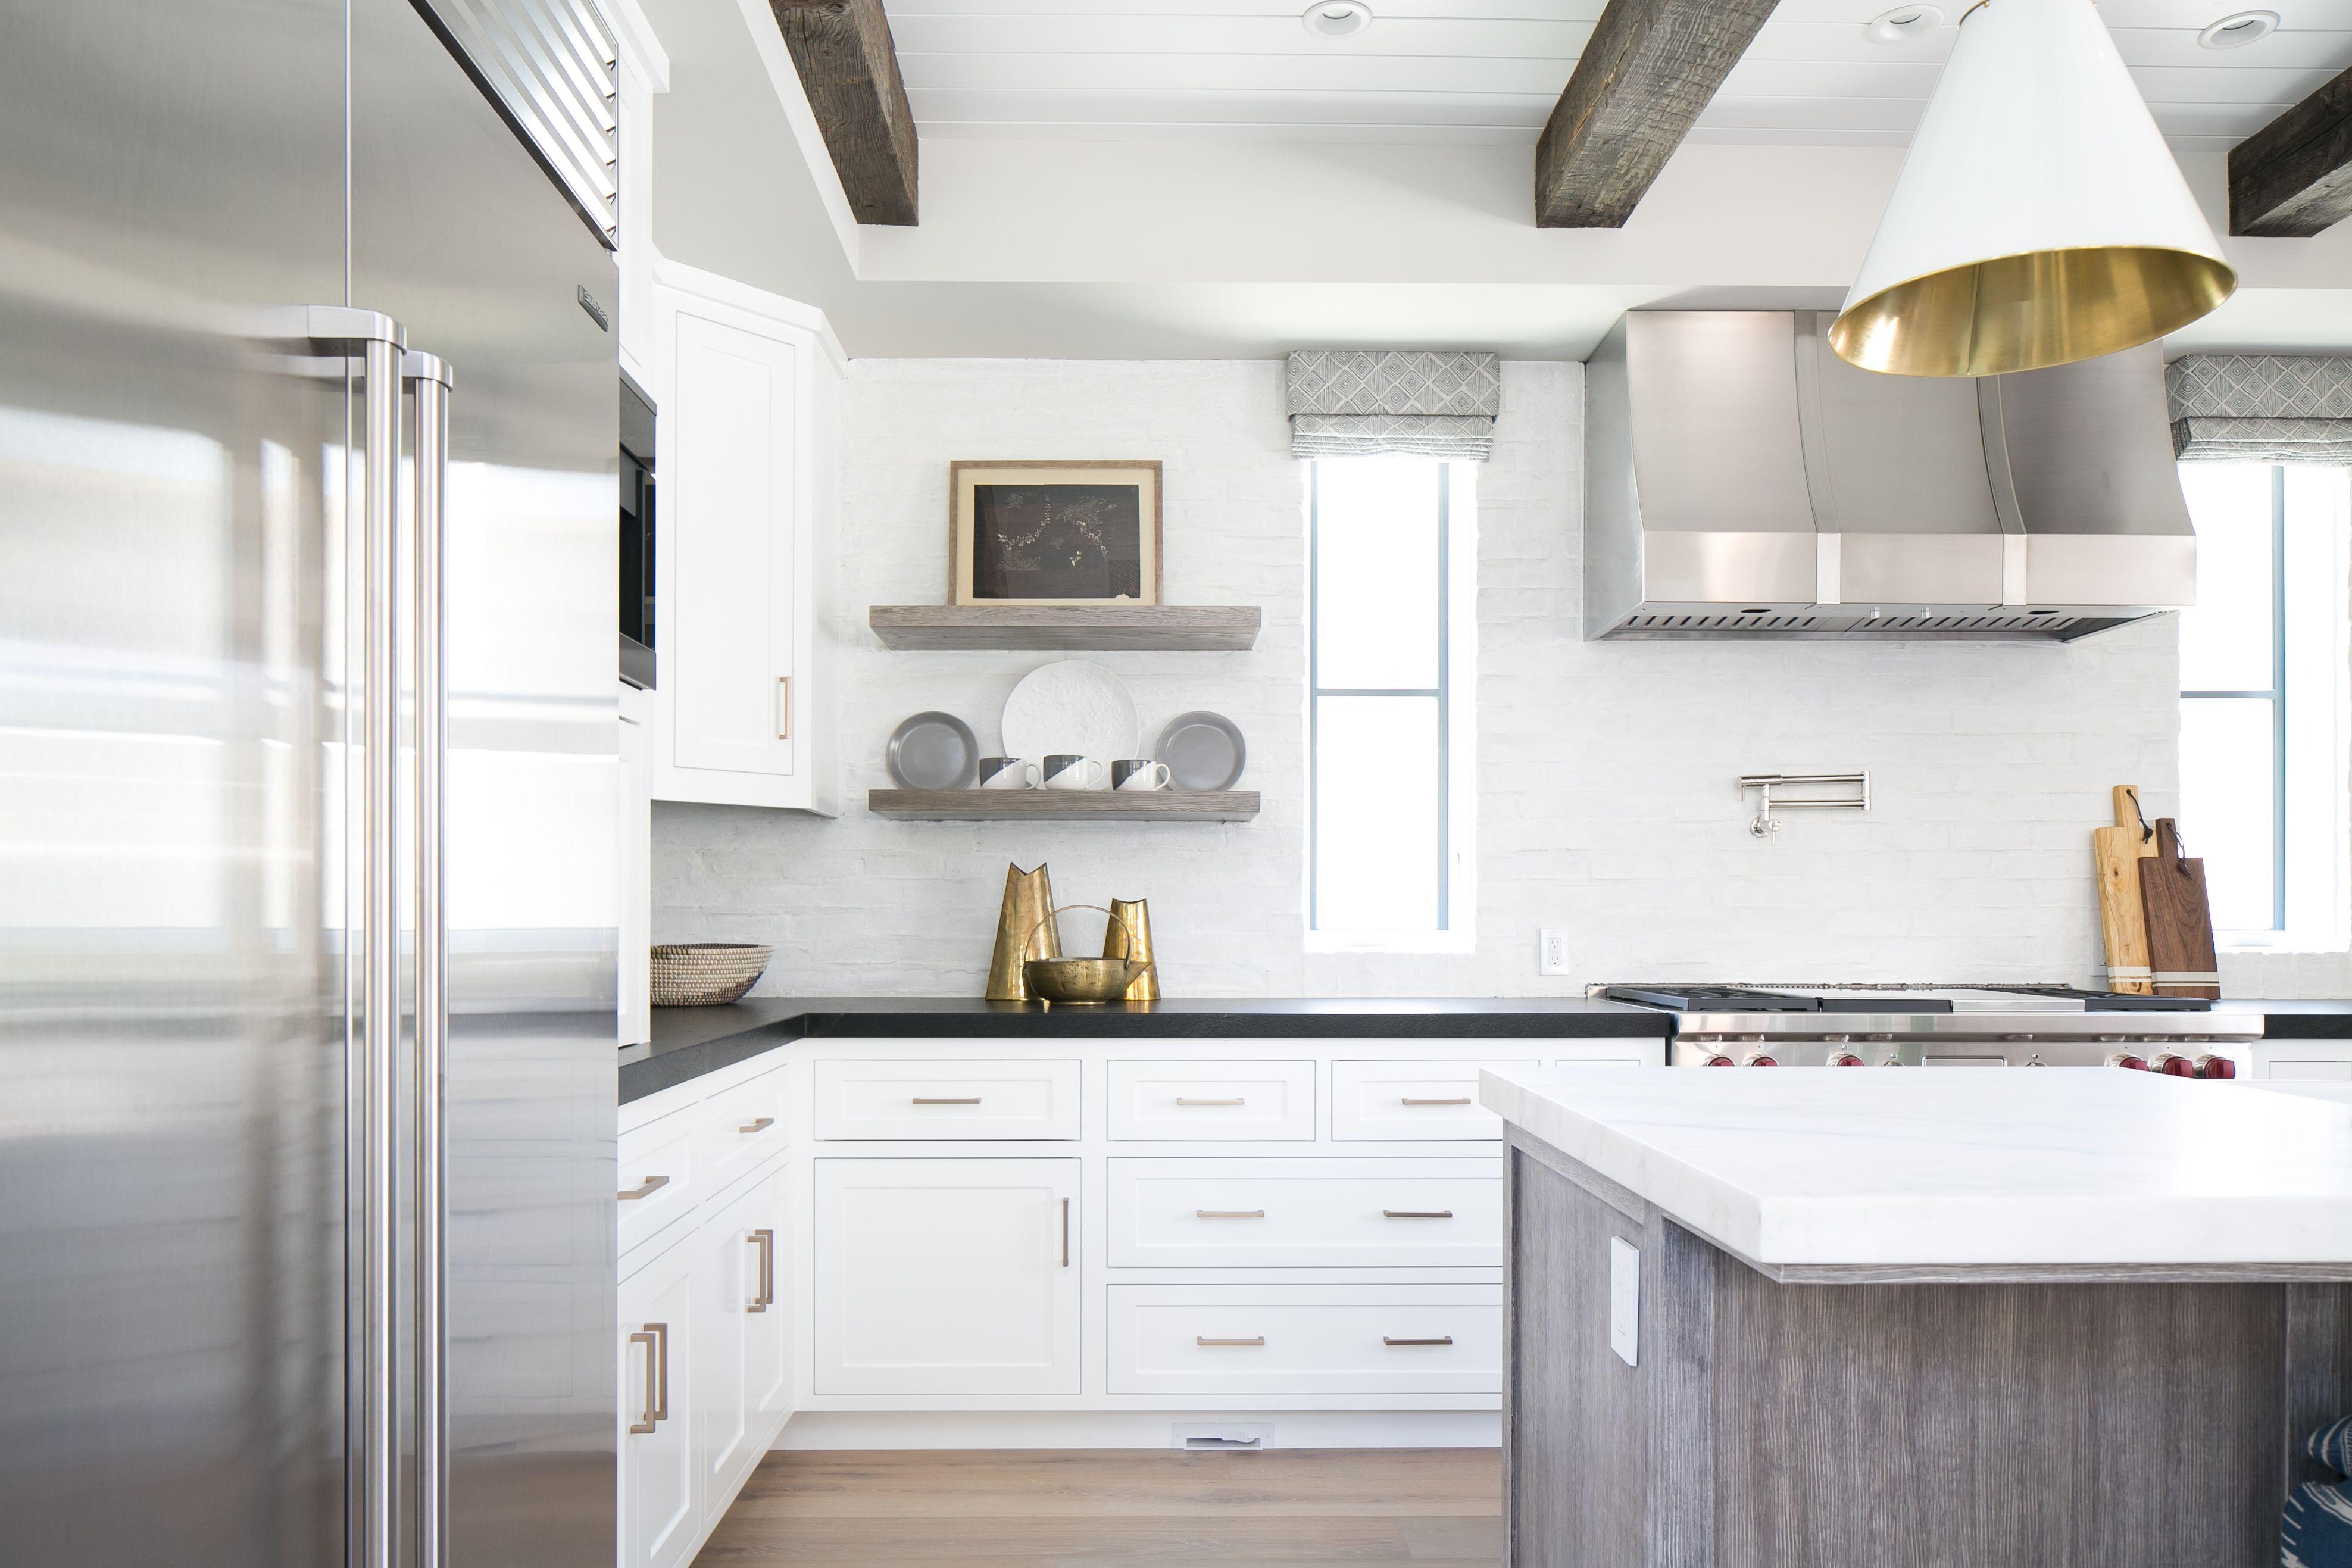 Best Kitchen White Kitchen Reclaimed Wood Beams Built In 640 x 480